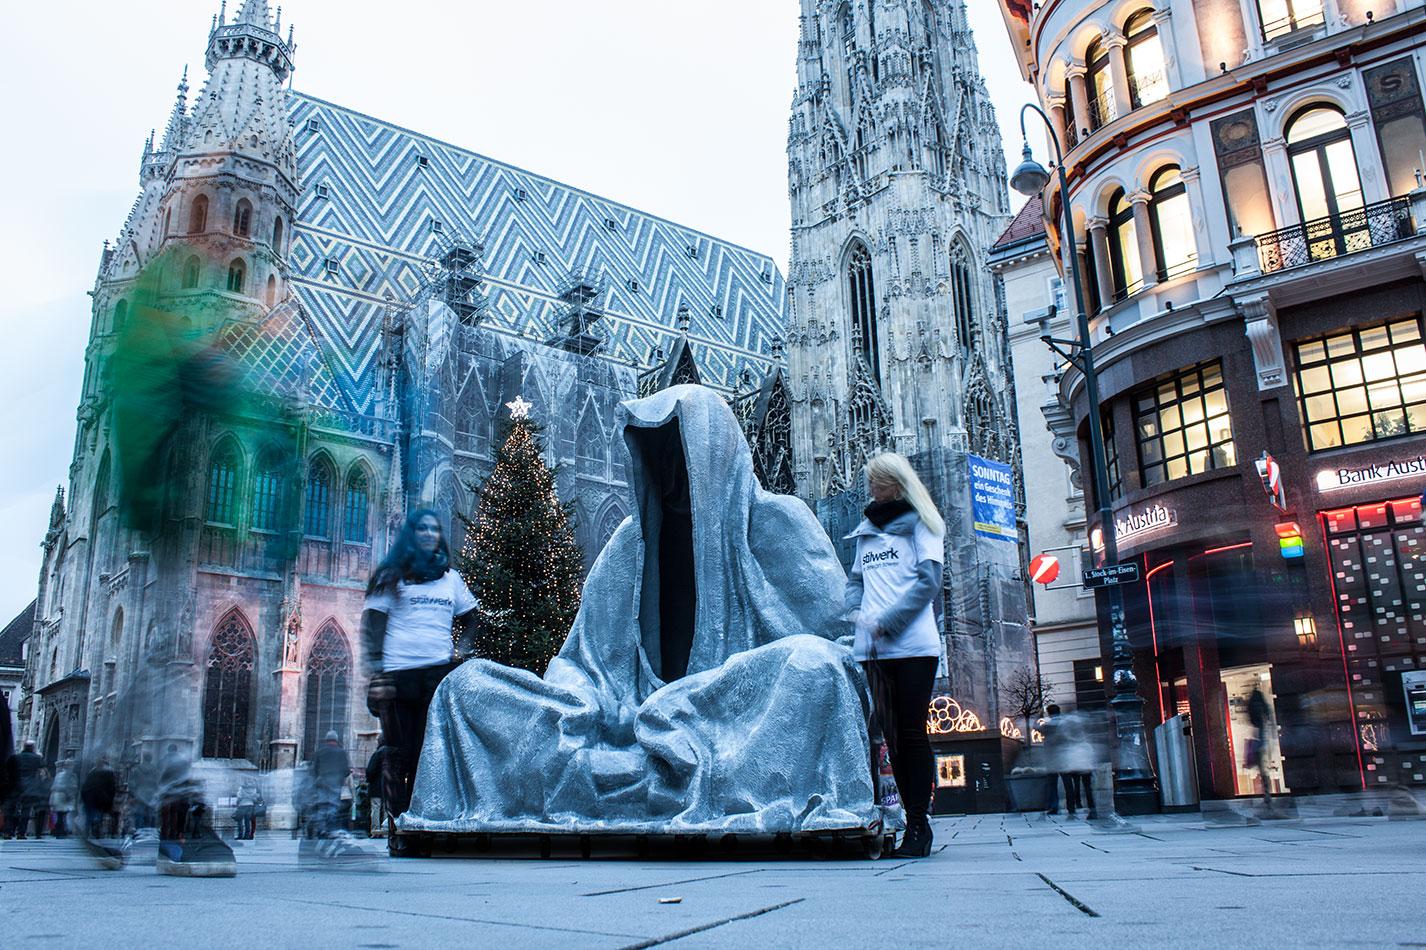 stilwerk-wien-design-tower-art-antique-fair-vienna-wikam-guardians-of-time-manfred-kielnhofer-duekouba-designkooperative-public-art-sculpture-transport-design-tour-vienna-4991